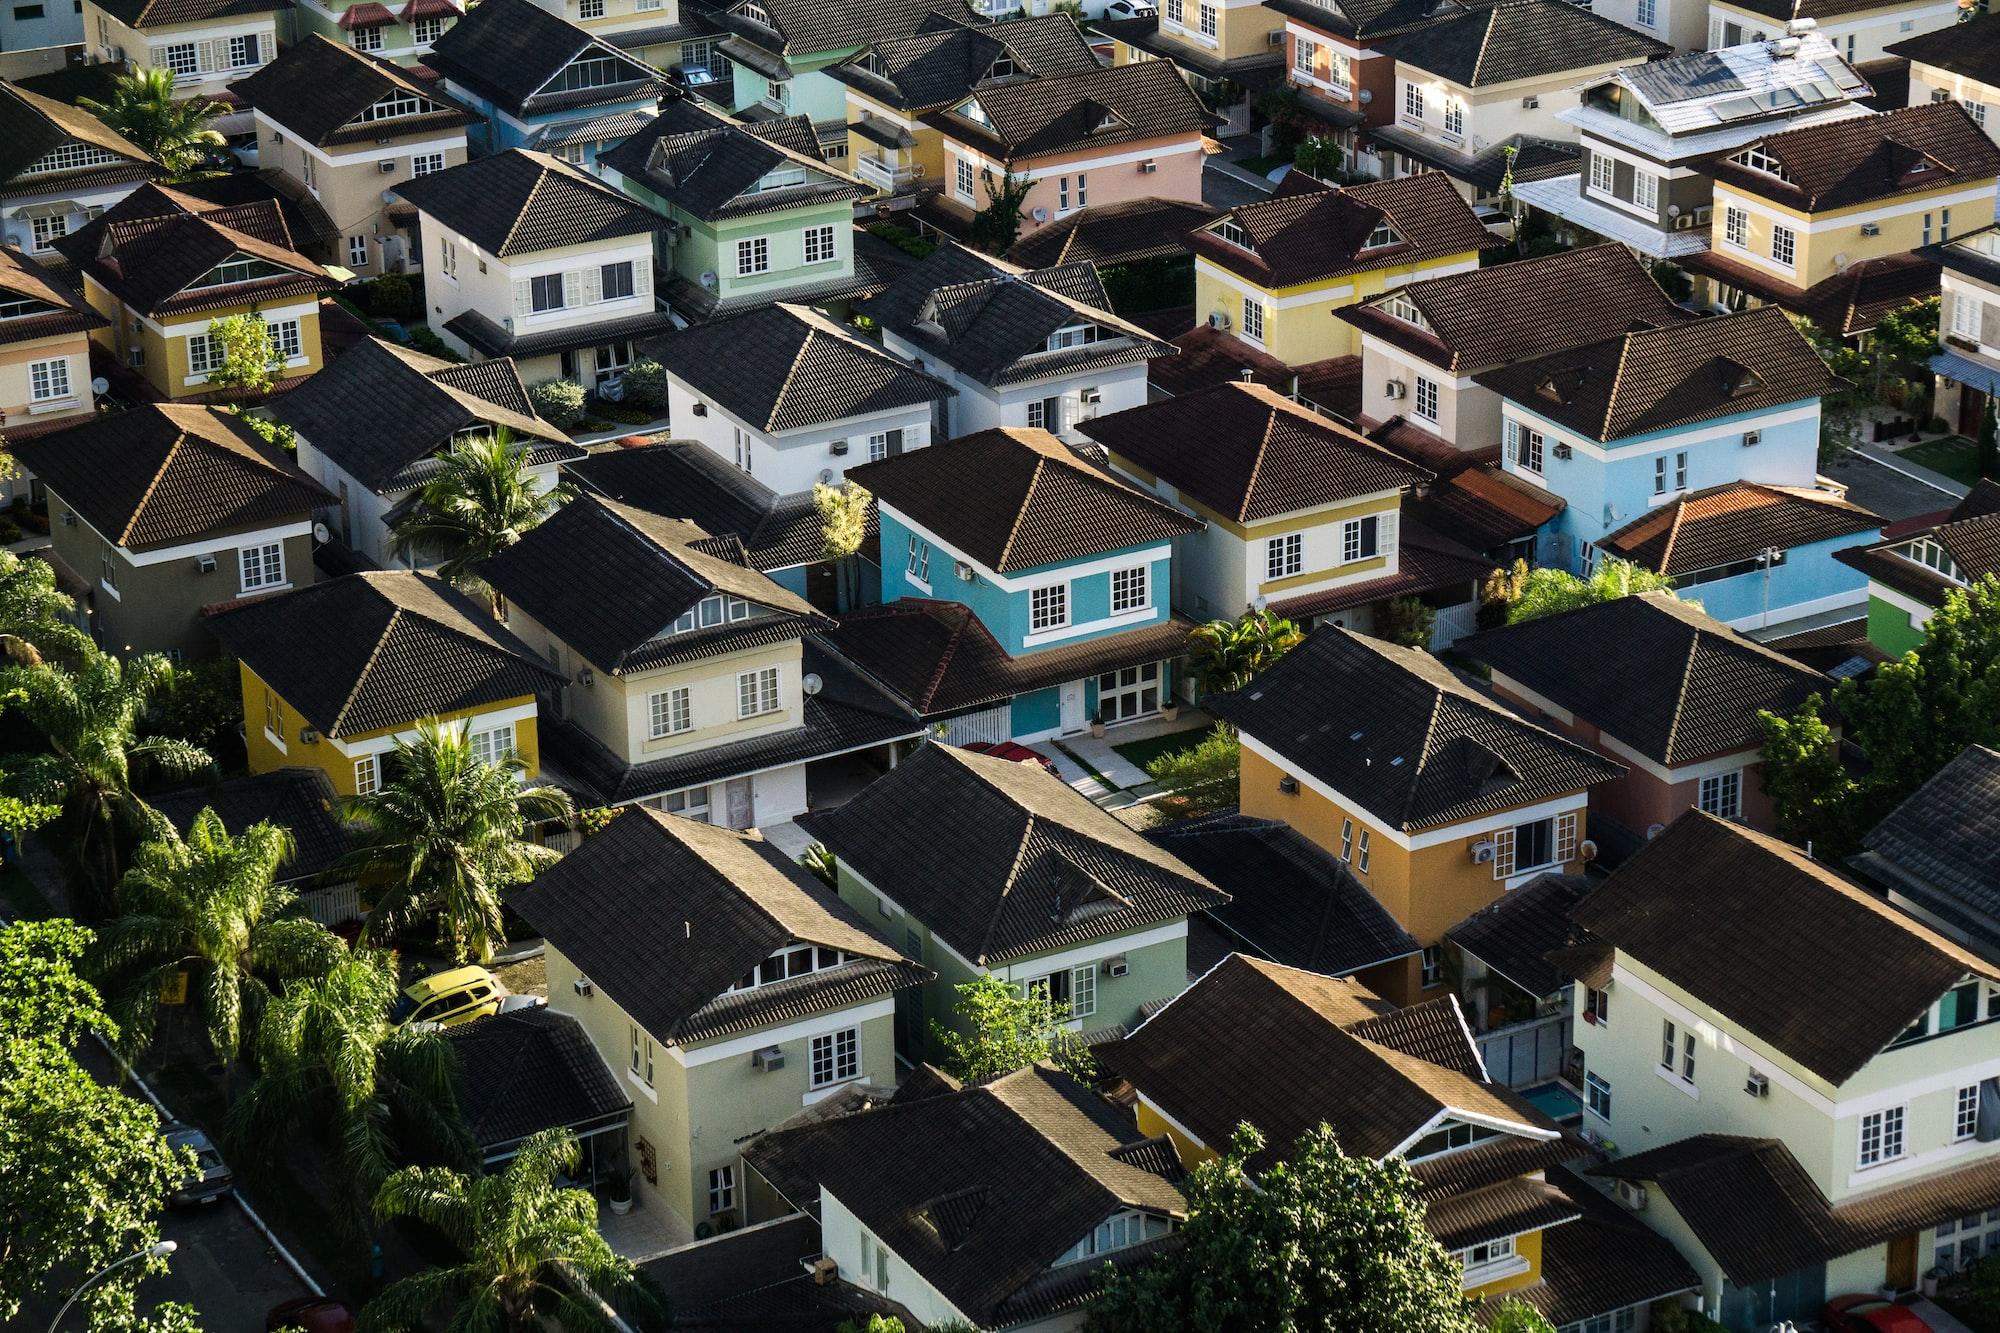 11 Real Estate Instagram Post Ideas